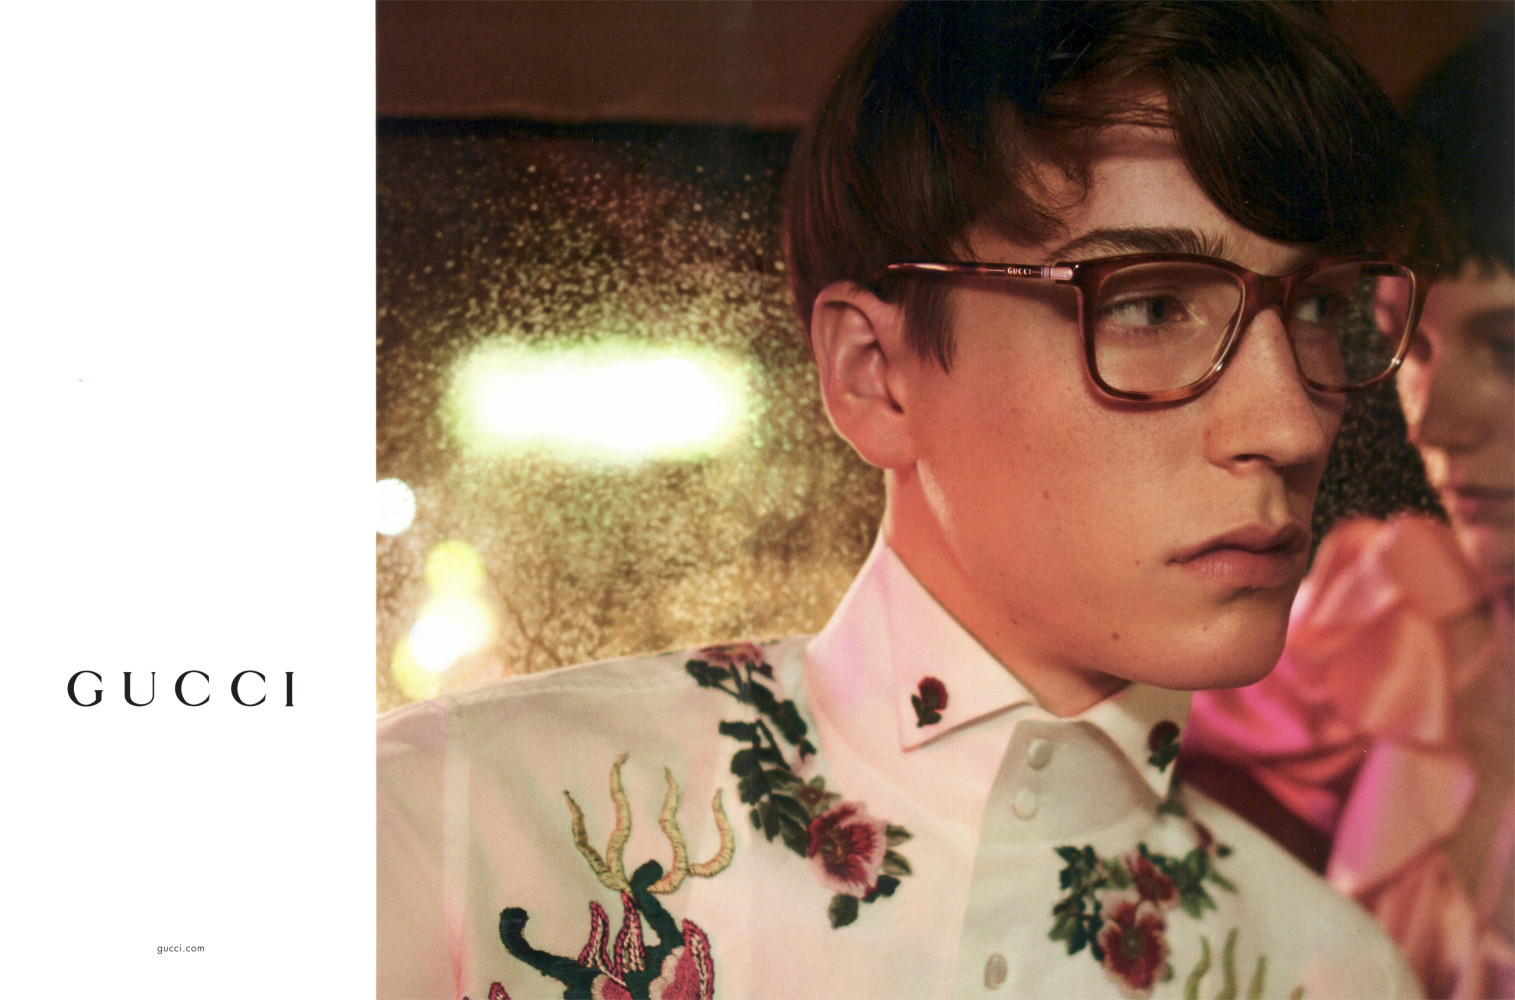 Gucci SS17 eyewear campaign